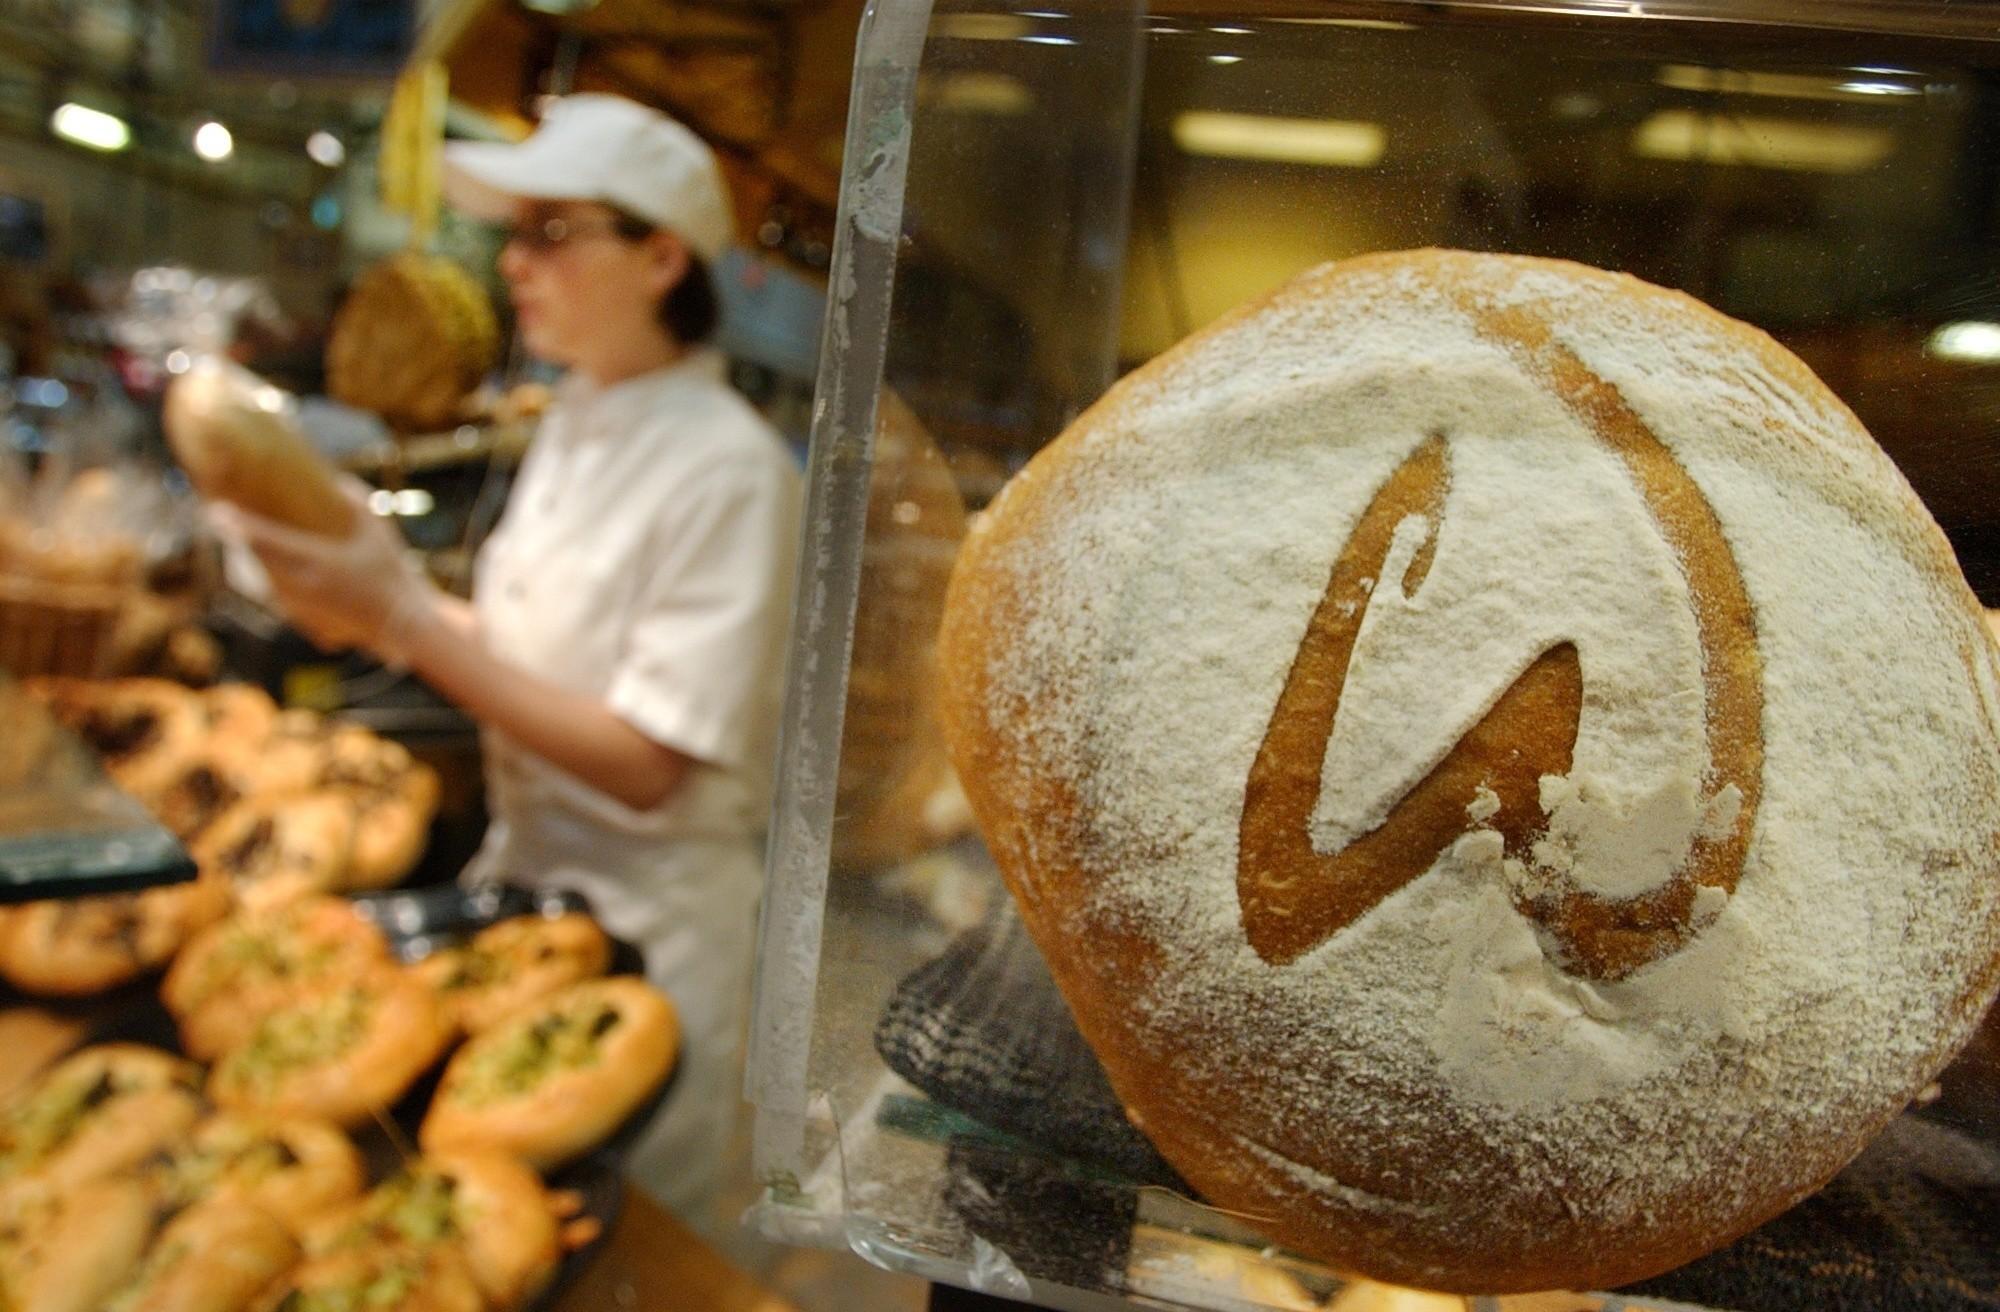 wegmans bakery data